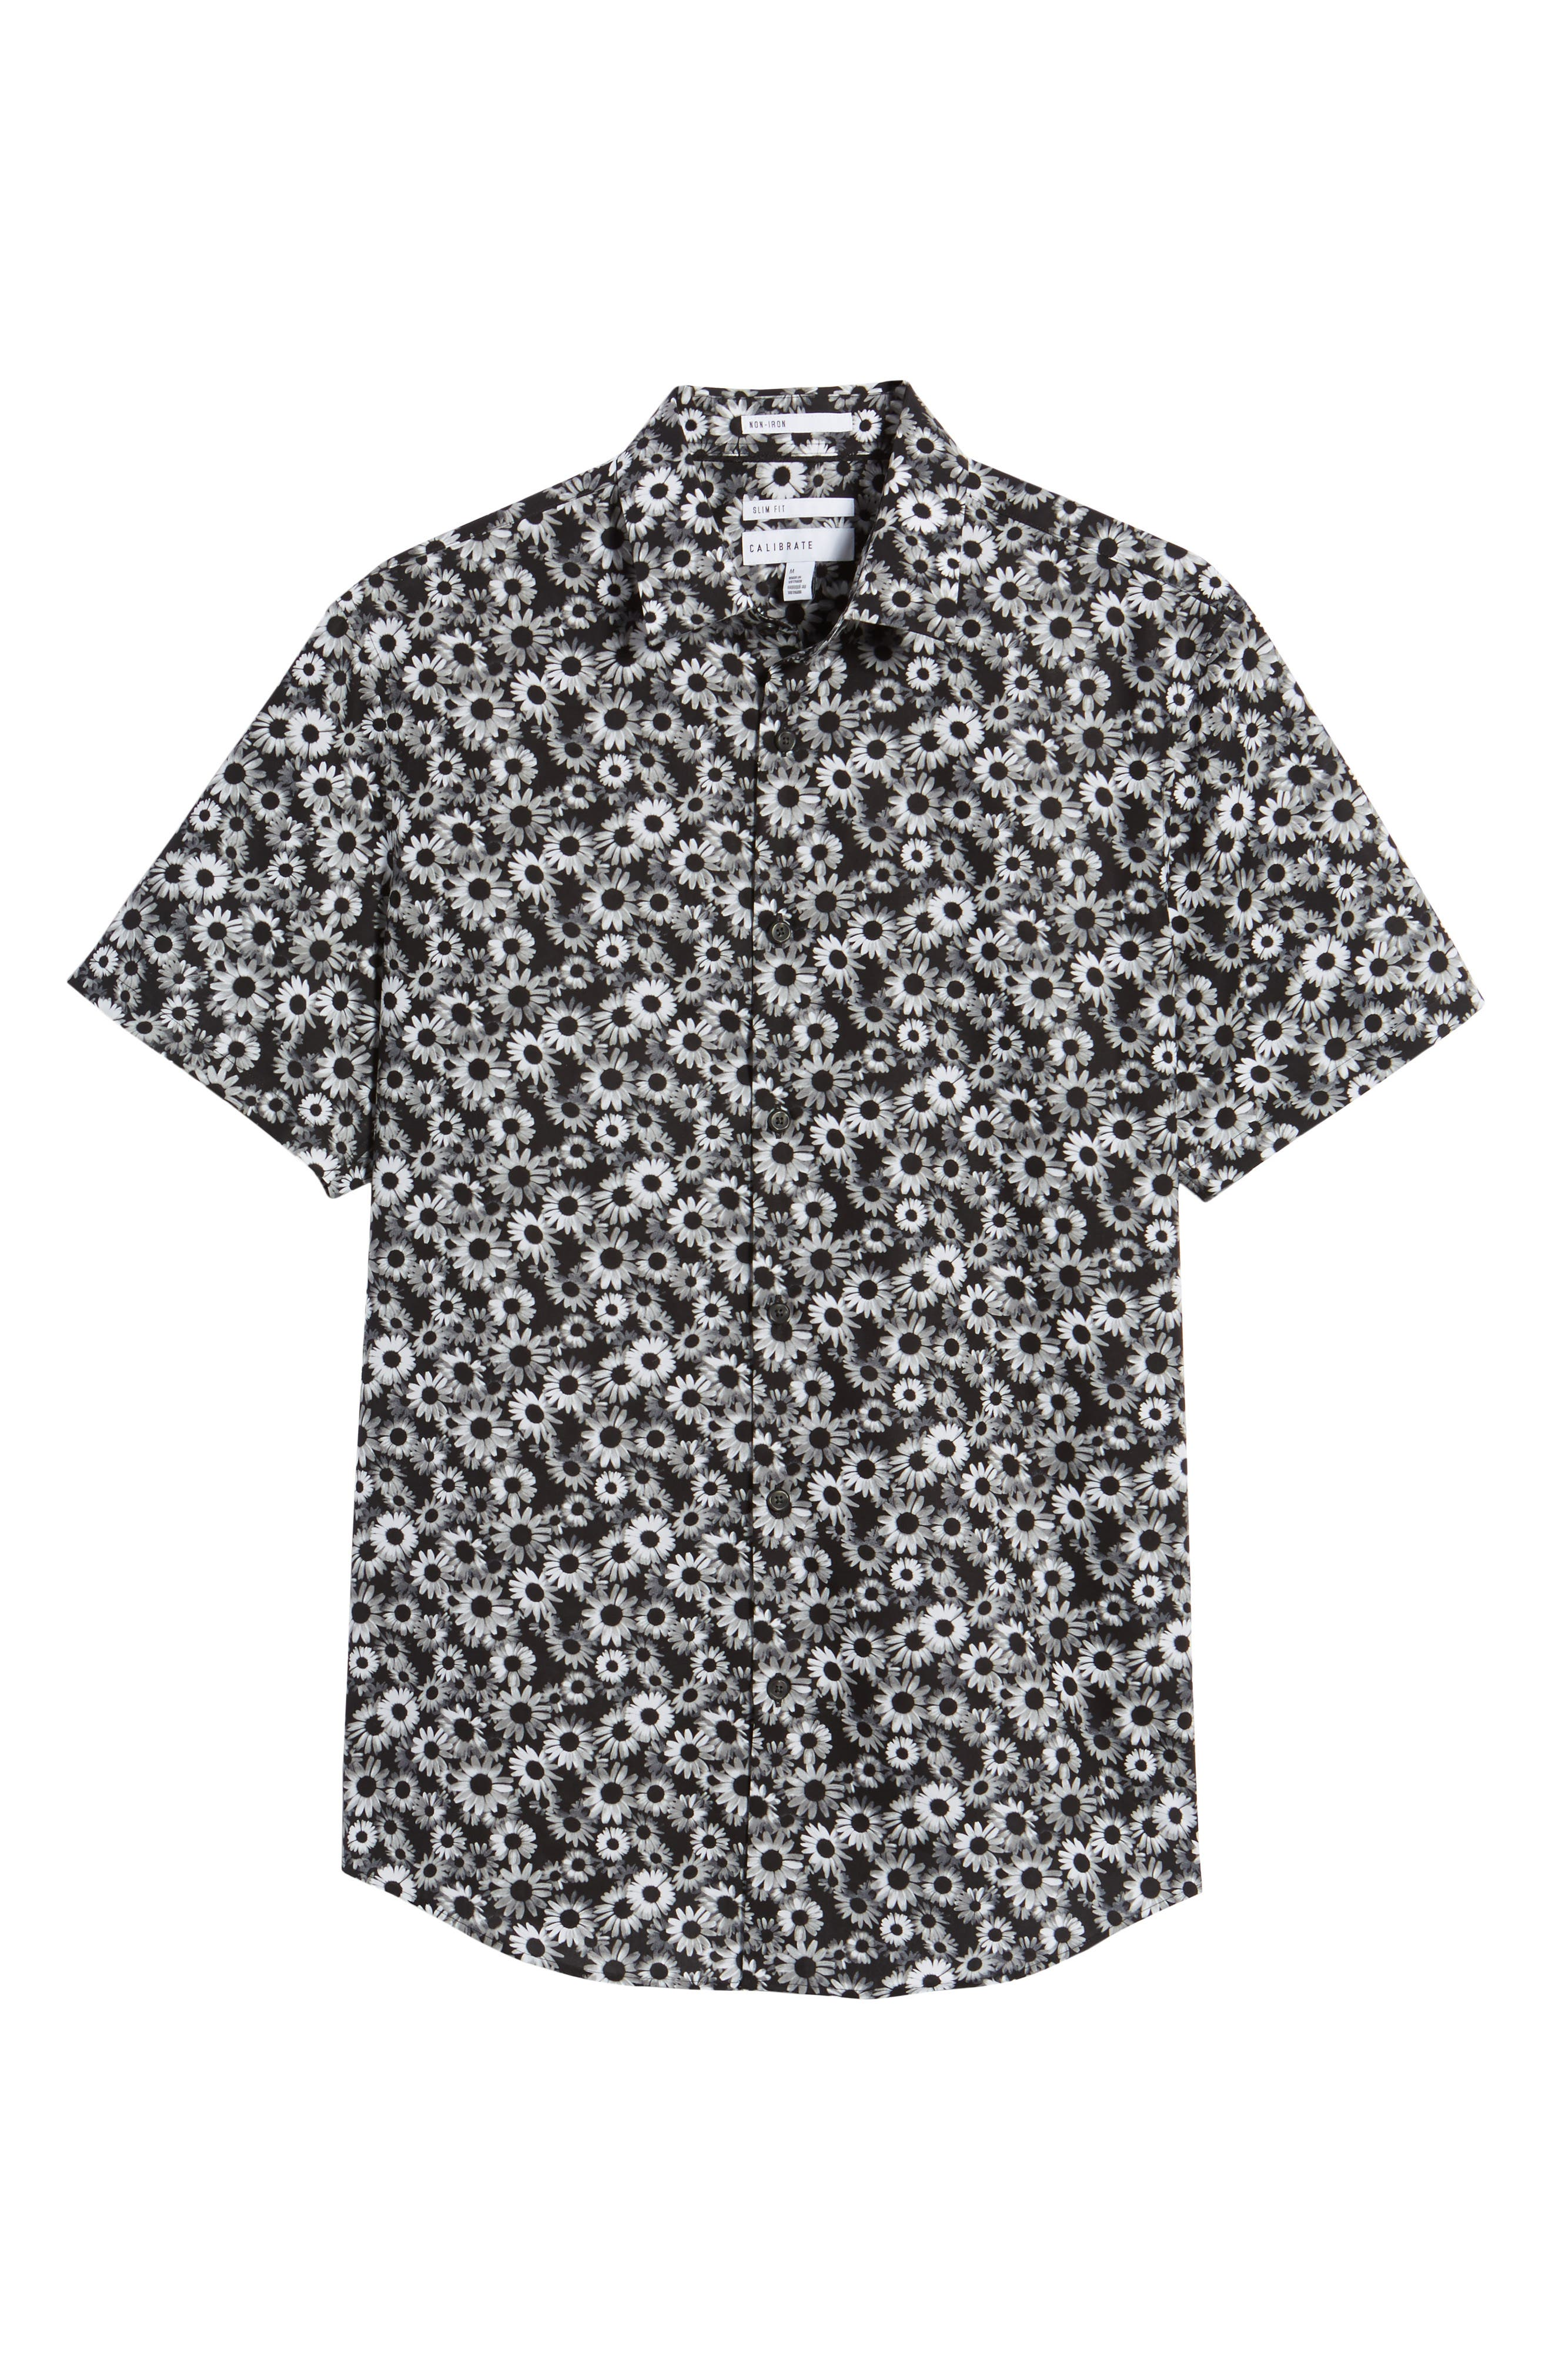 Floral Sport Shirt,                             Alternate thumbnail 6, color,                             BLACK WHITE DAISY FLORAL